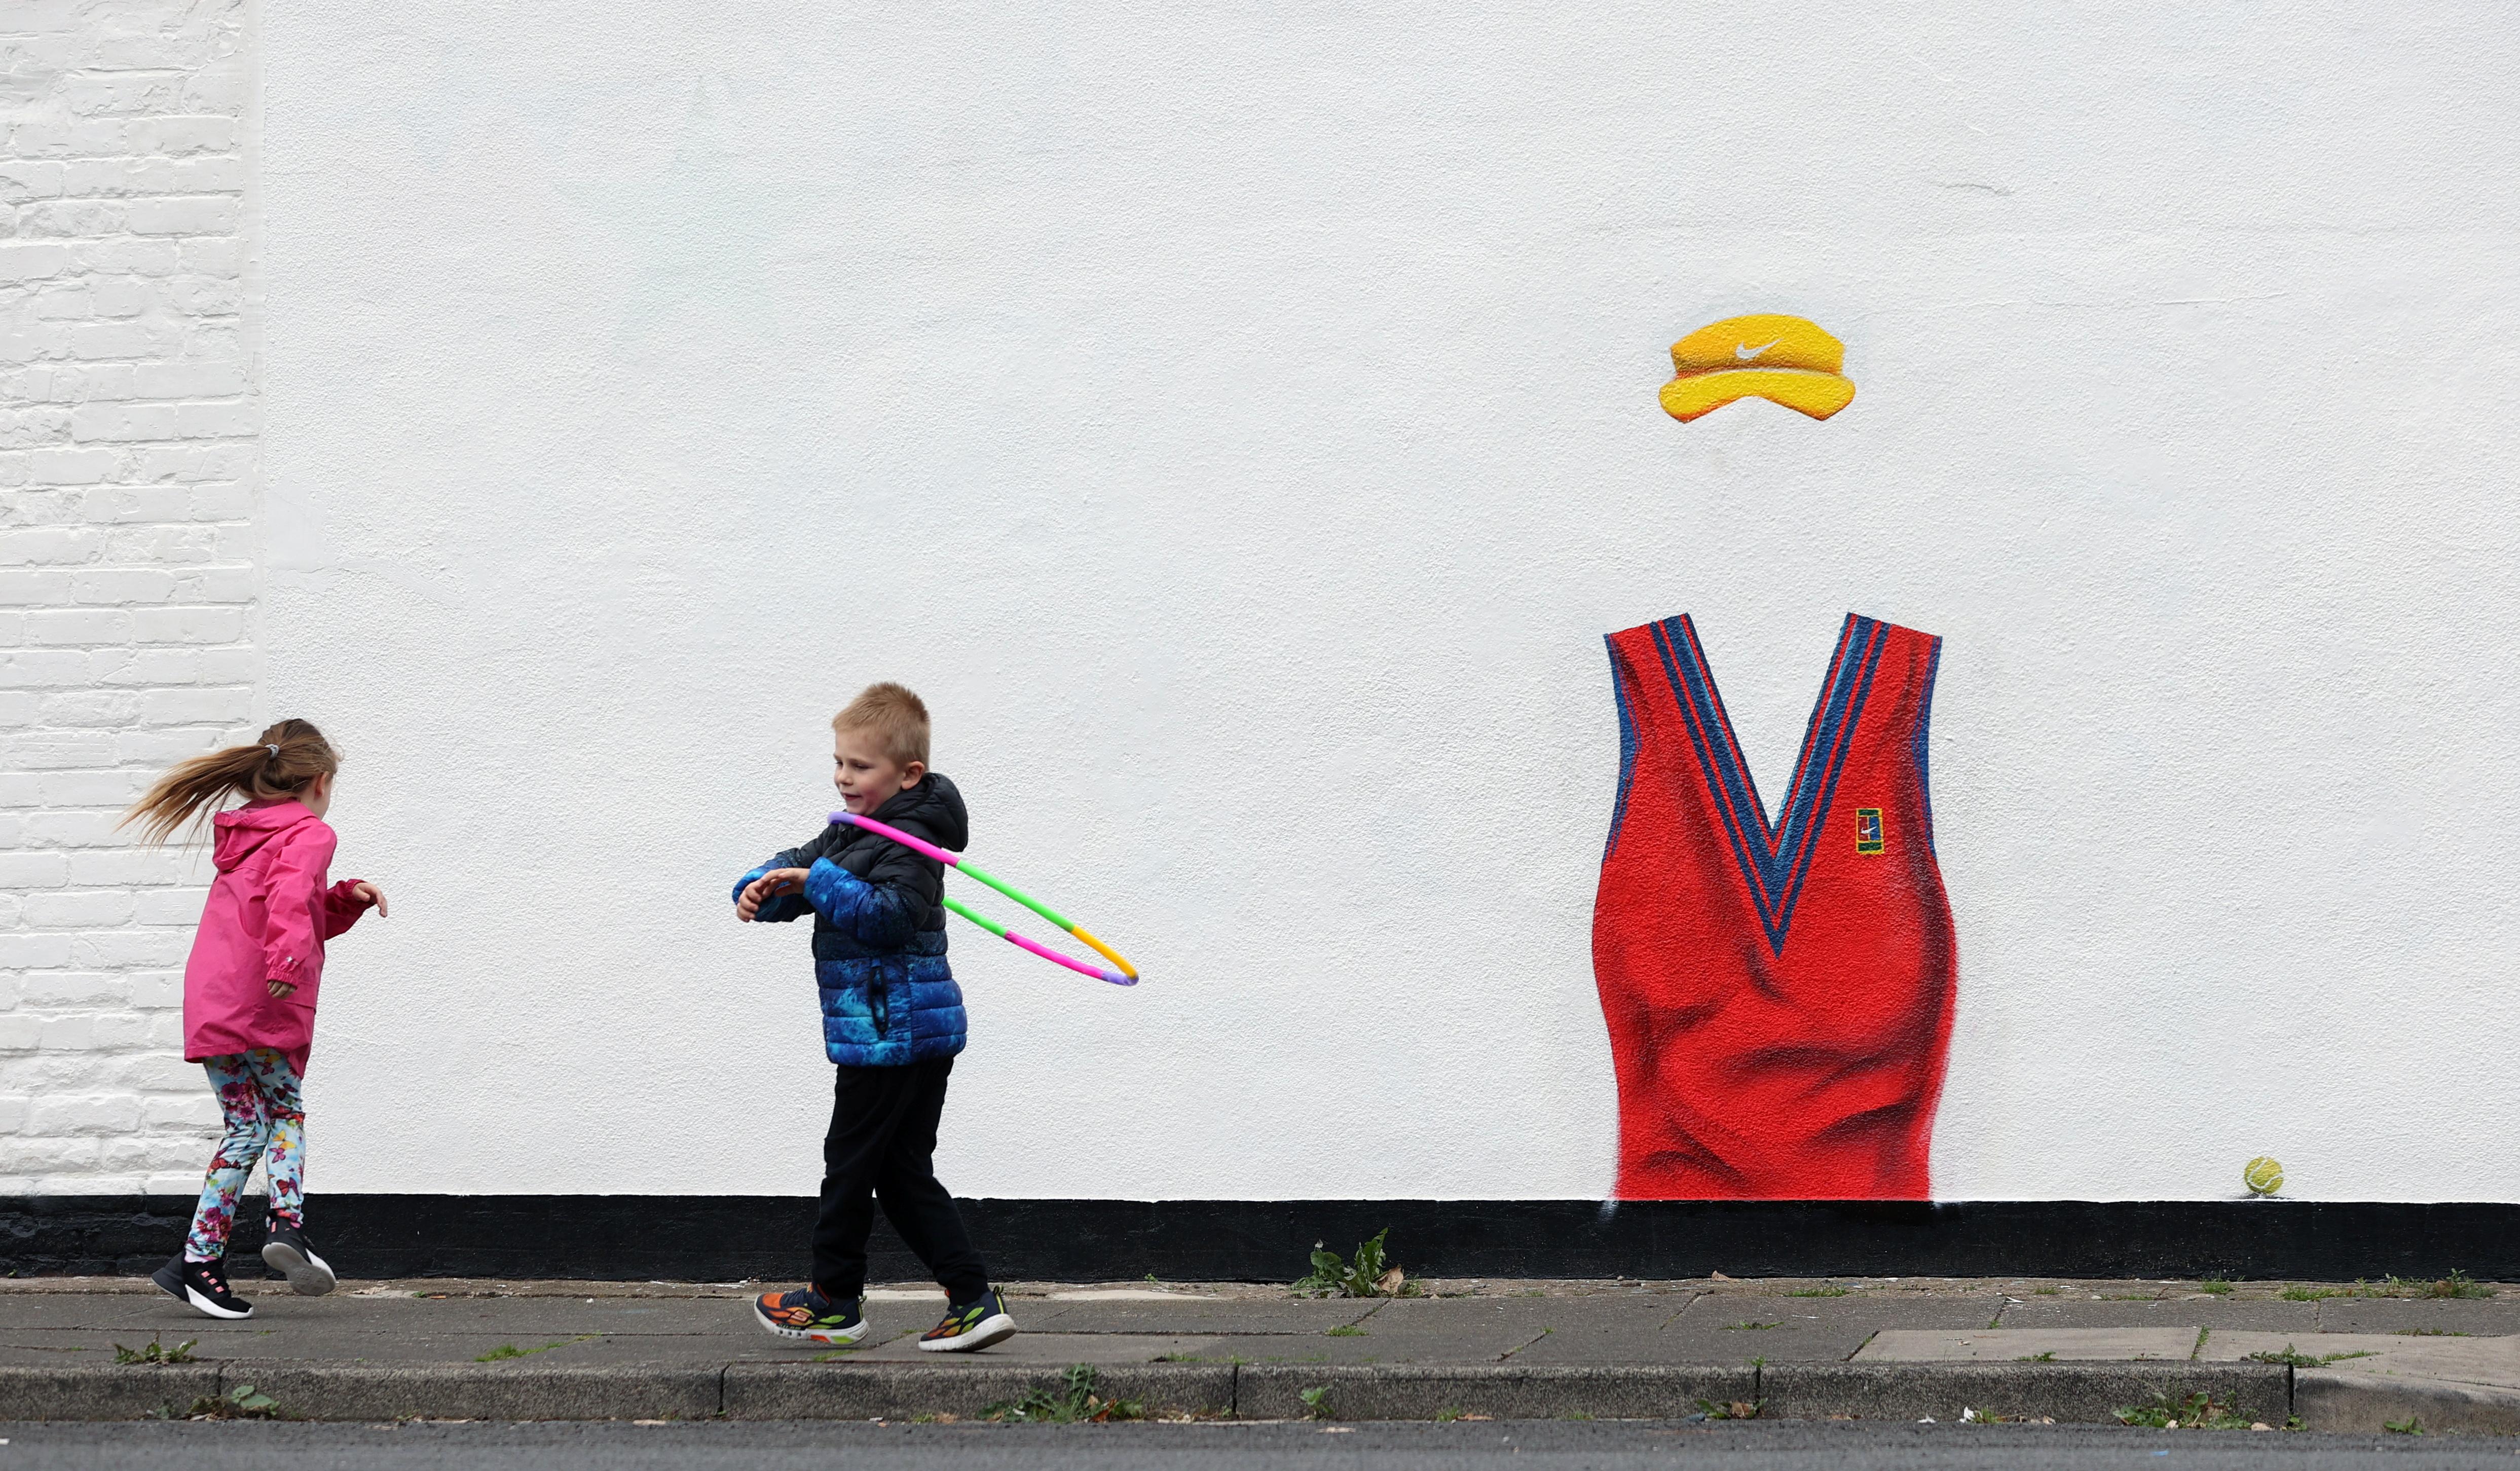 Children play next to a mural dedicated to British tennis player Emma Raducanu in Darlington, Britain September 19, 2021. REUTERS/Lee Smith